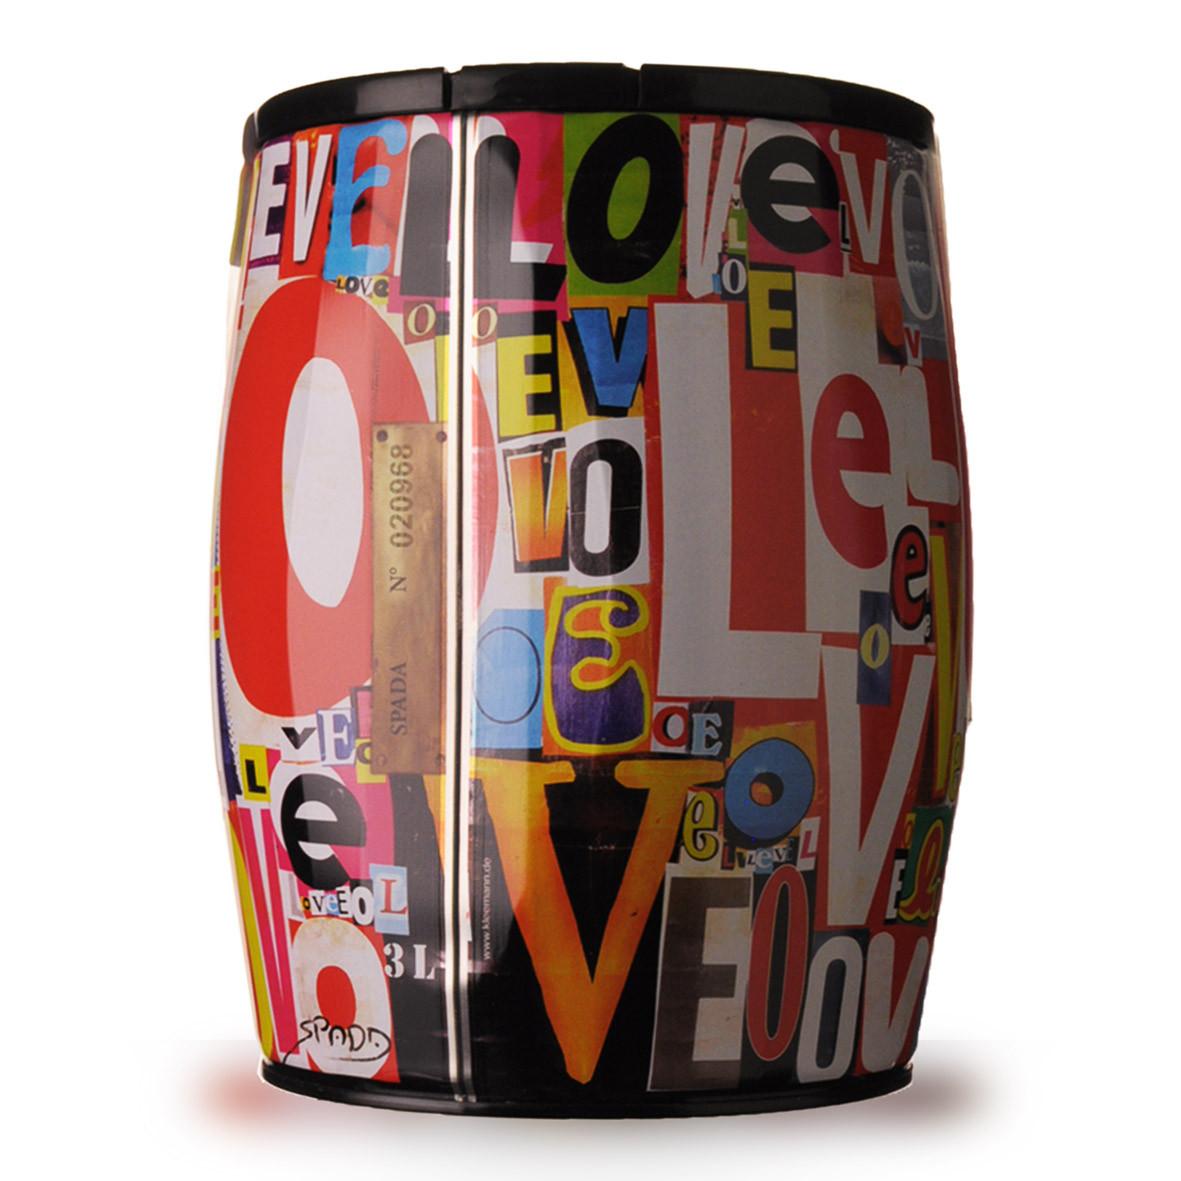 Bag-in-Box 3L Le Benjamin de Puech-Haut Pays dOc Rouge Spada www.odyssee-vins.com